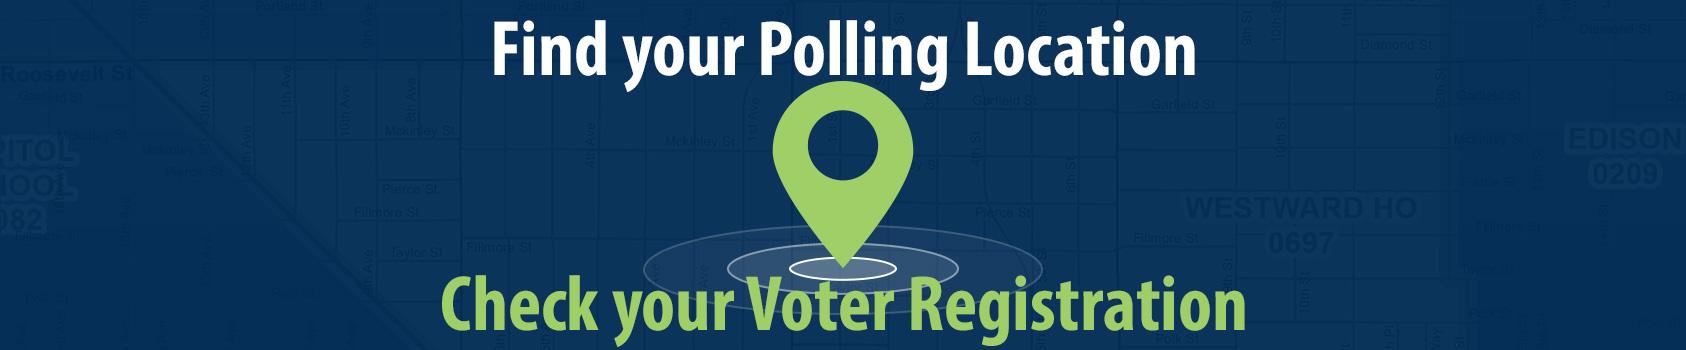 polling_location_button.jpg